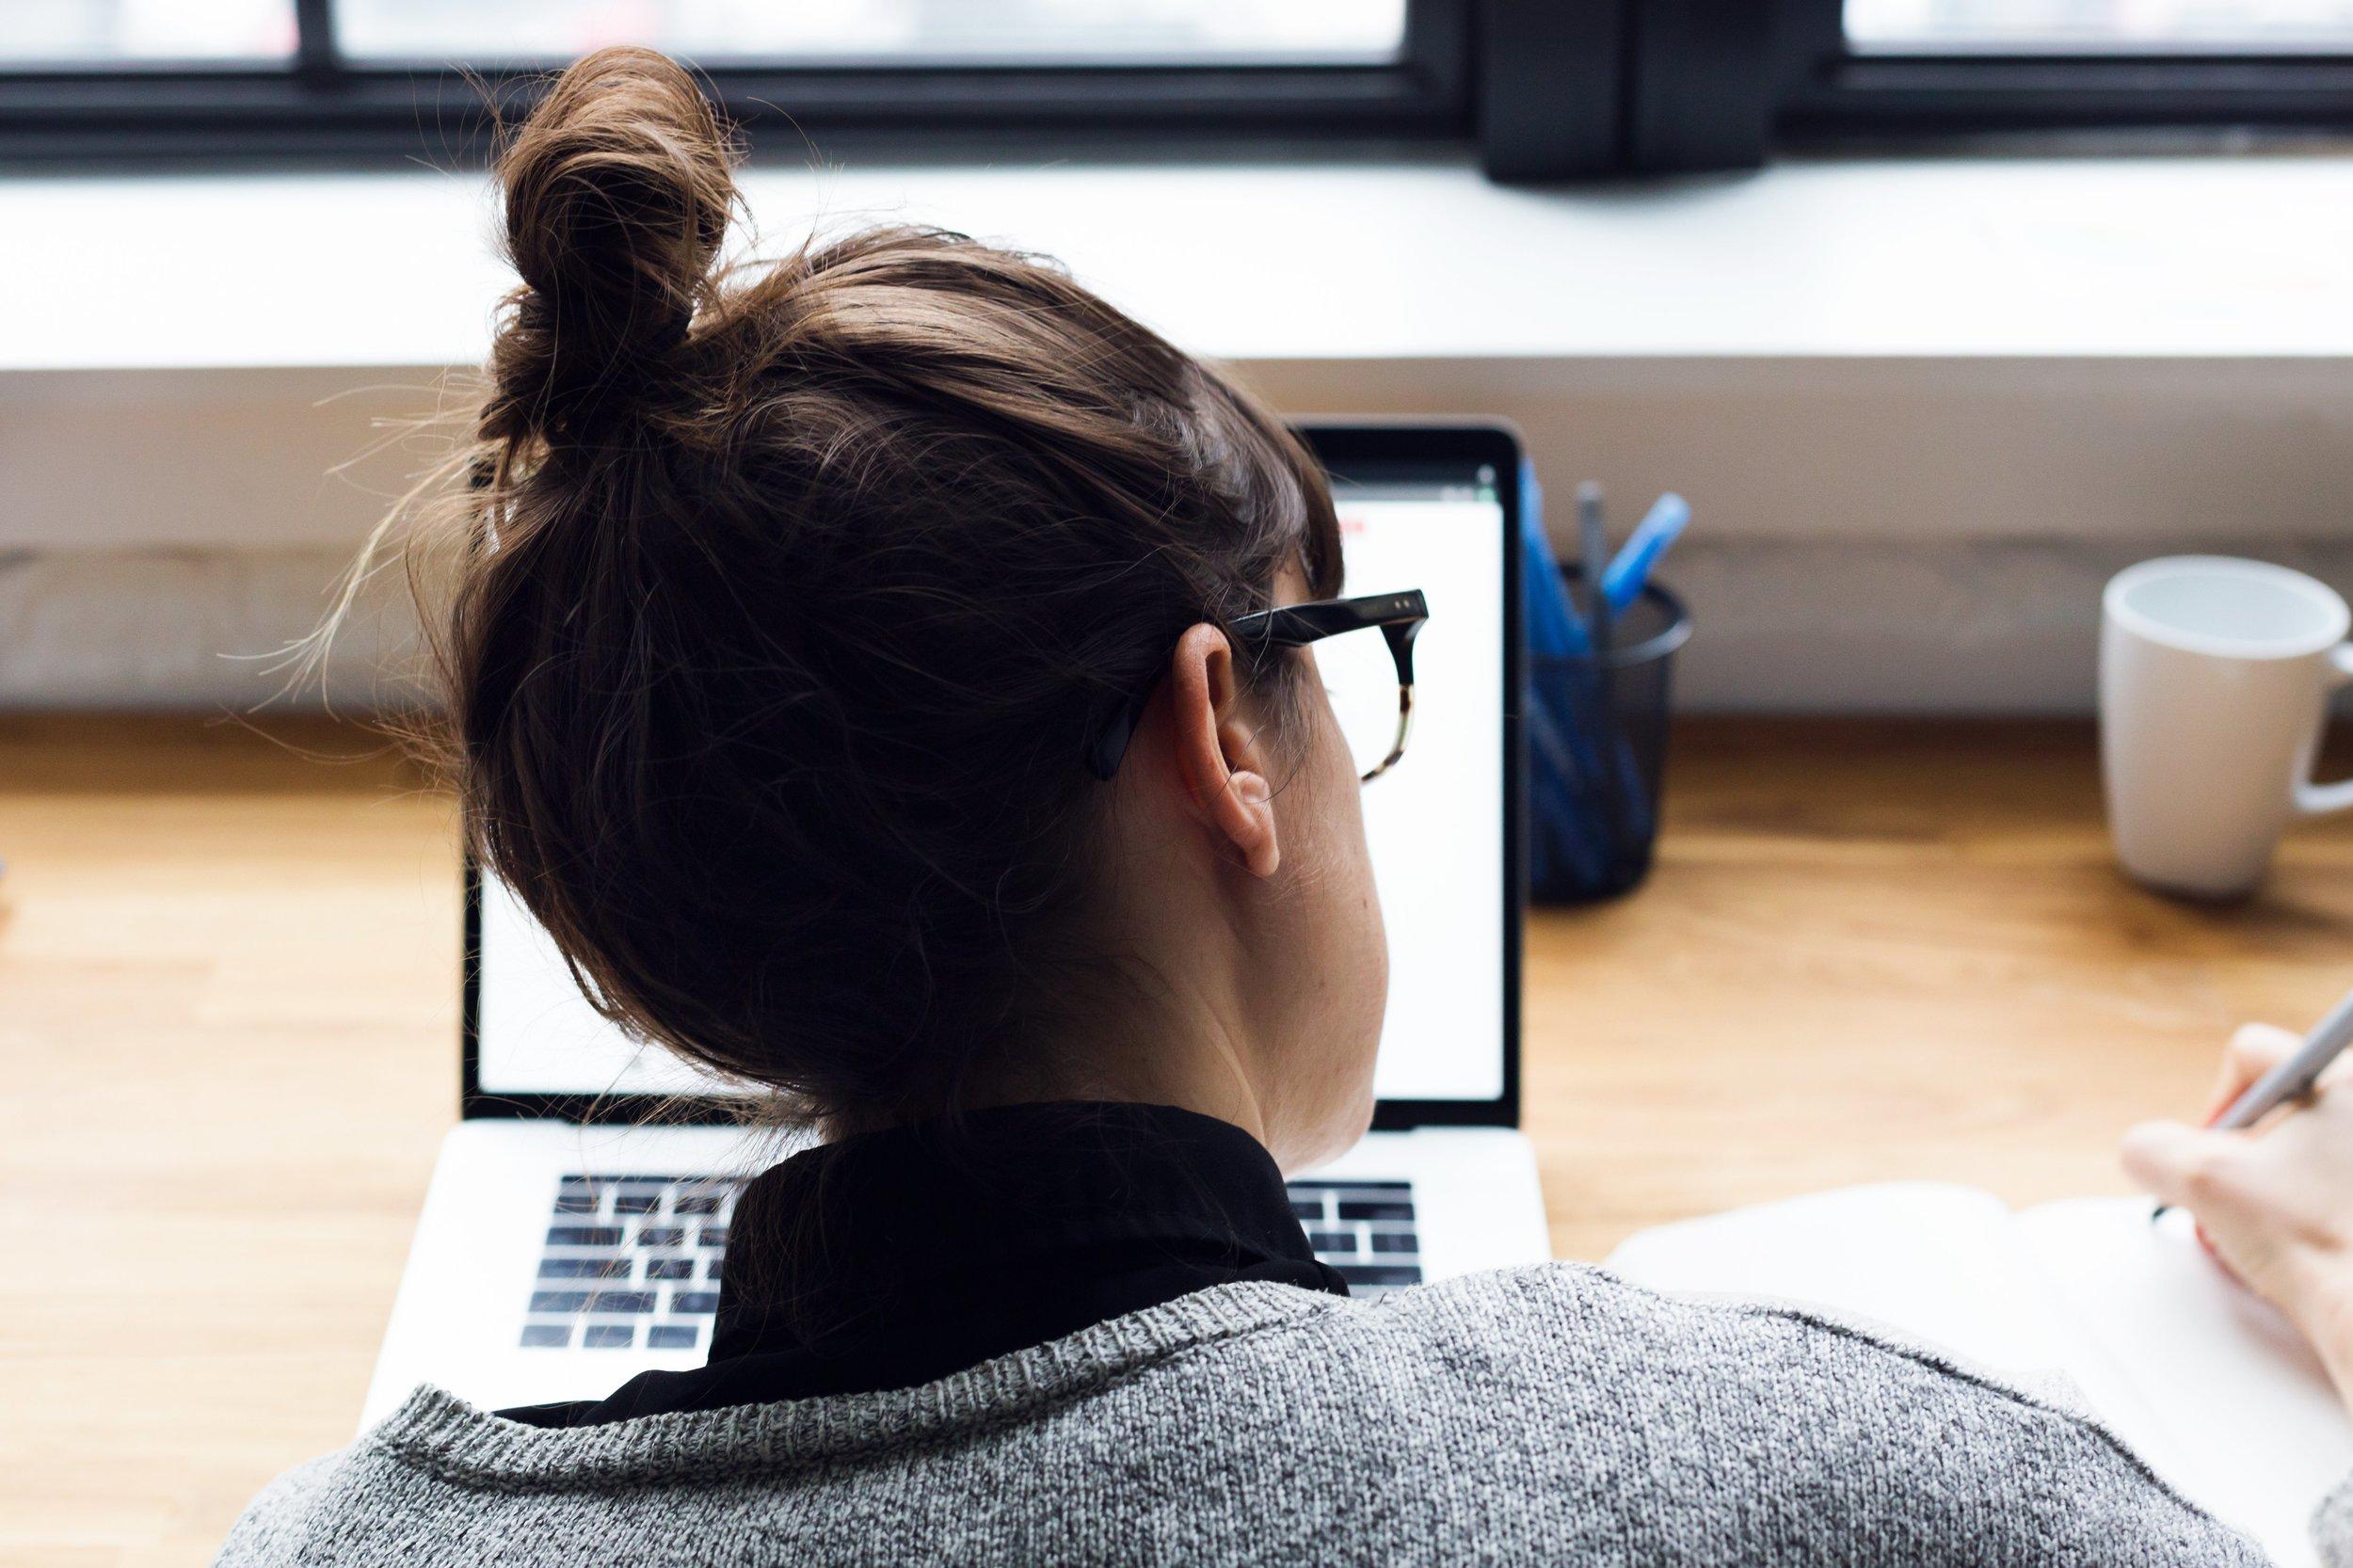 female-taking-notes-and-browsing-laptop_4460x4460.jpg